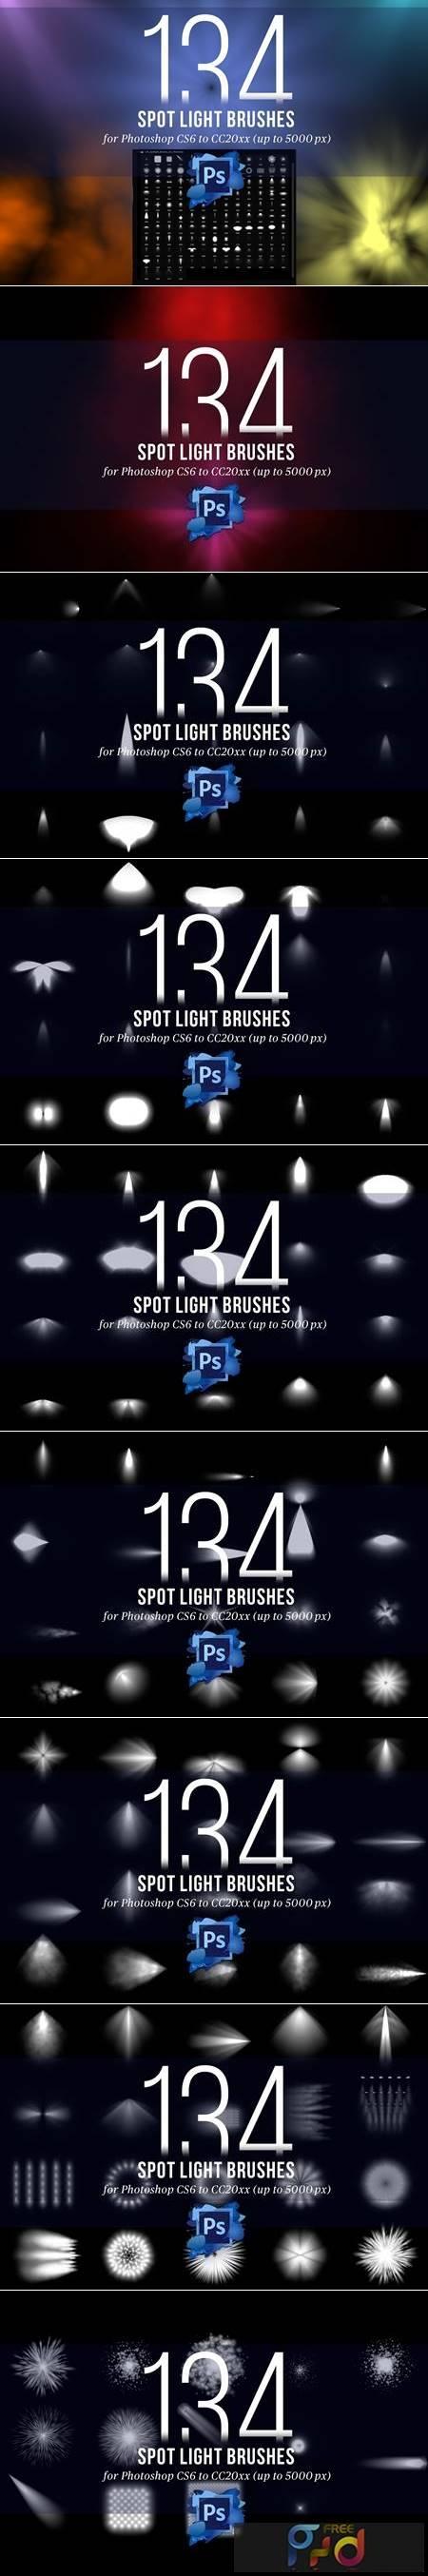 134 Spotlight Brushes for Photoshop 4445949 1